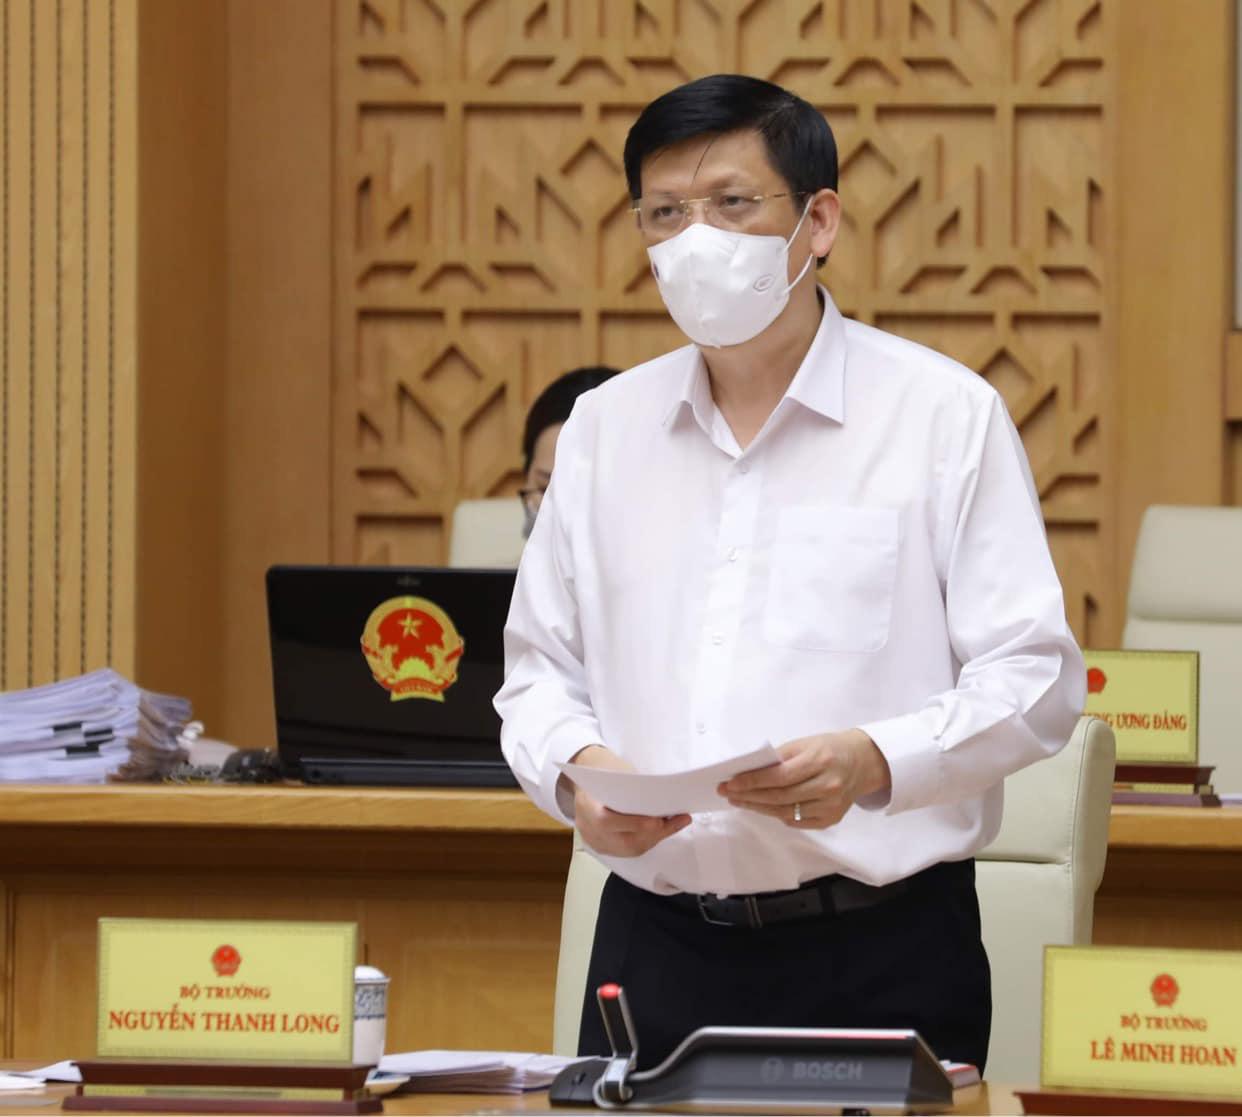 Vietnam extends COVID-19 quarantine period to 21 days